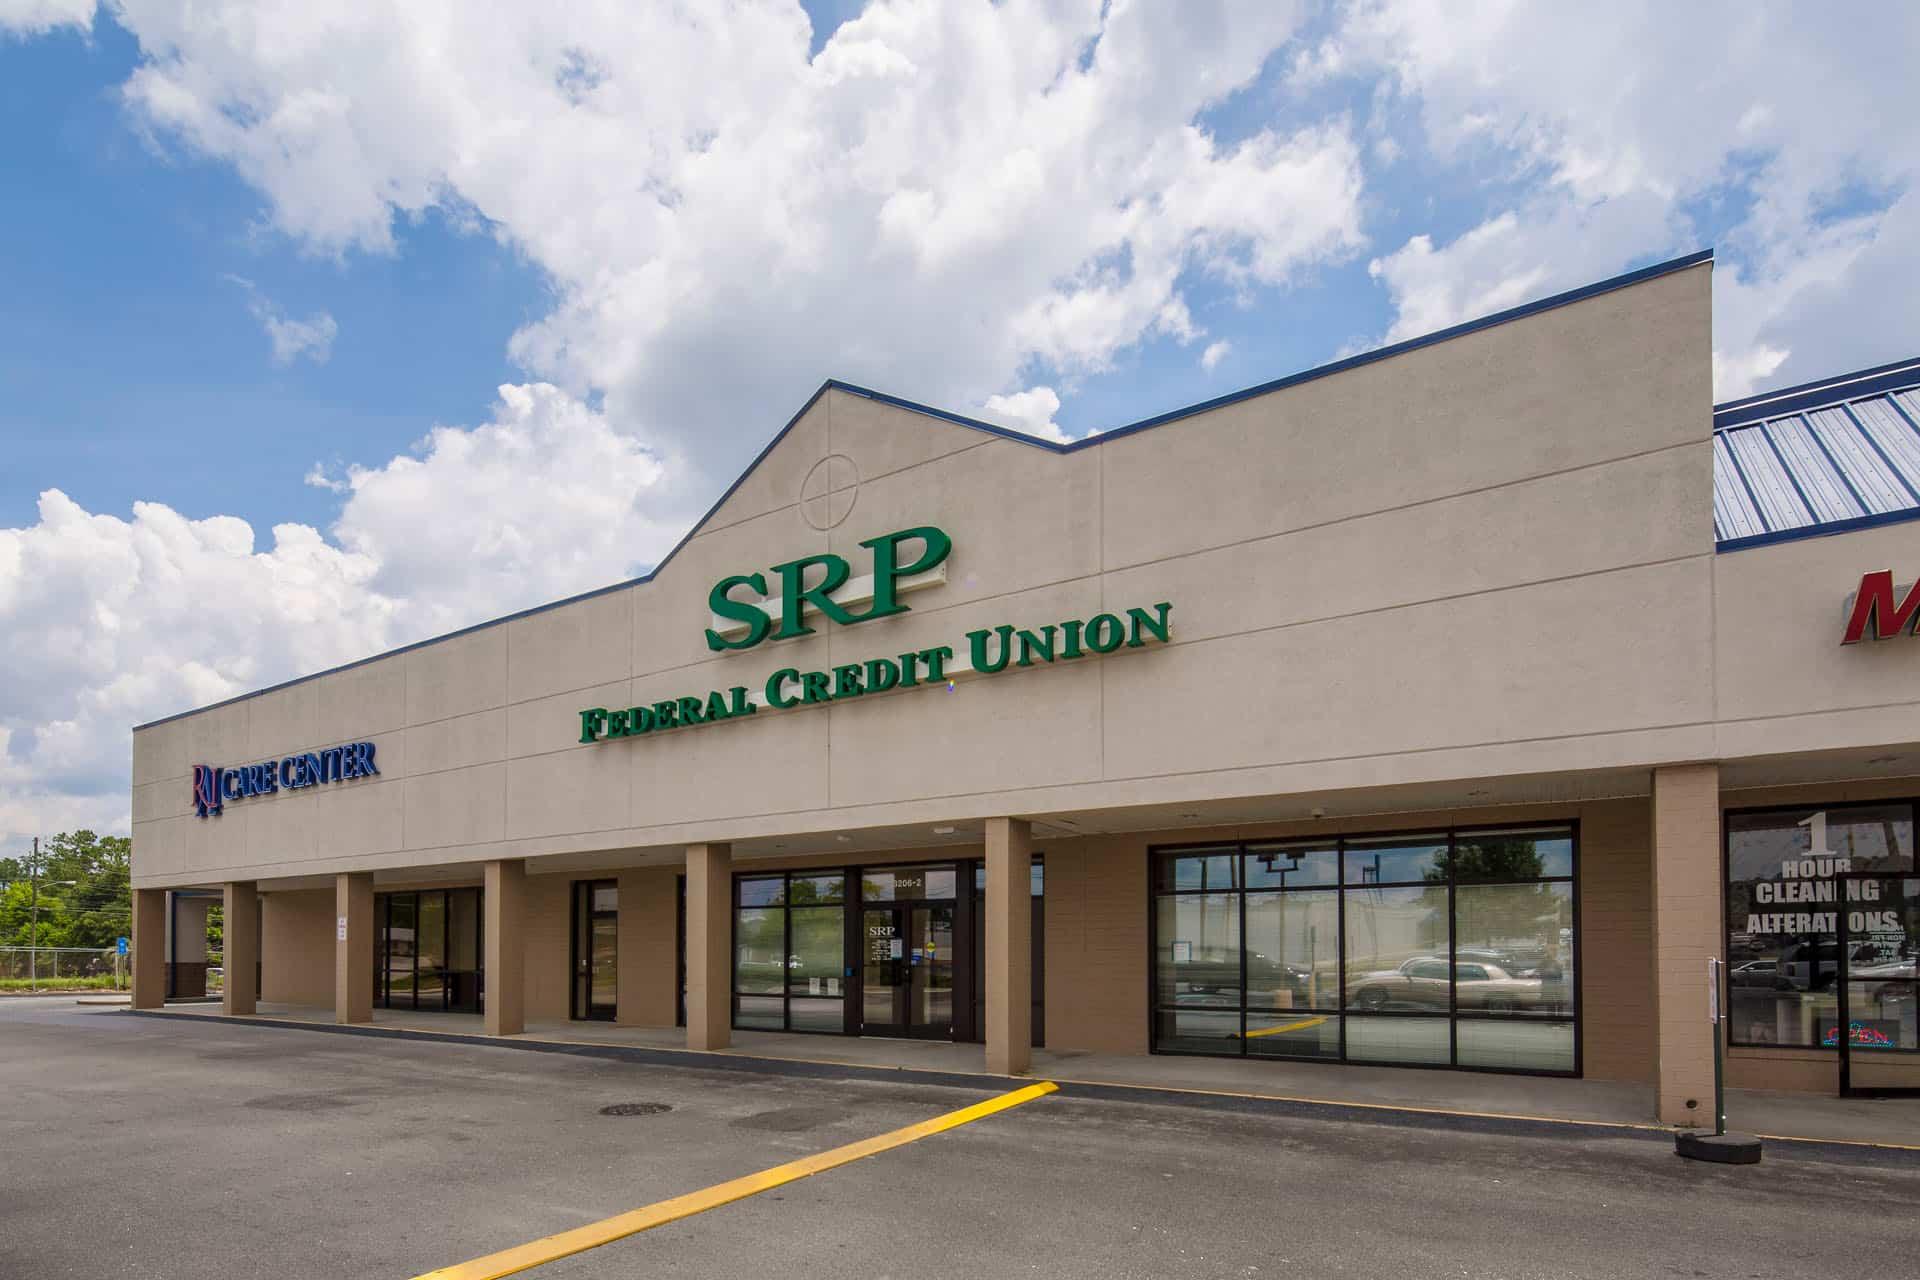 SRP_CreditUnion-01